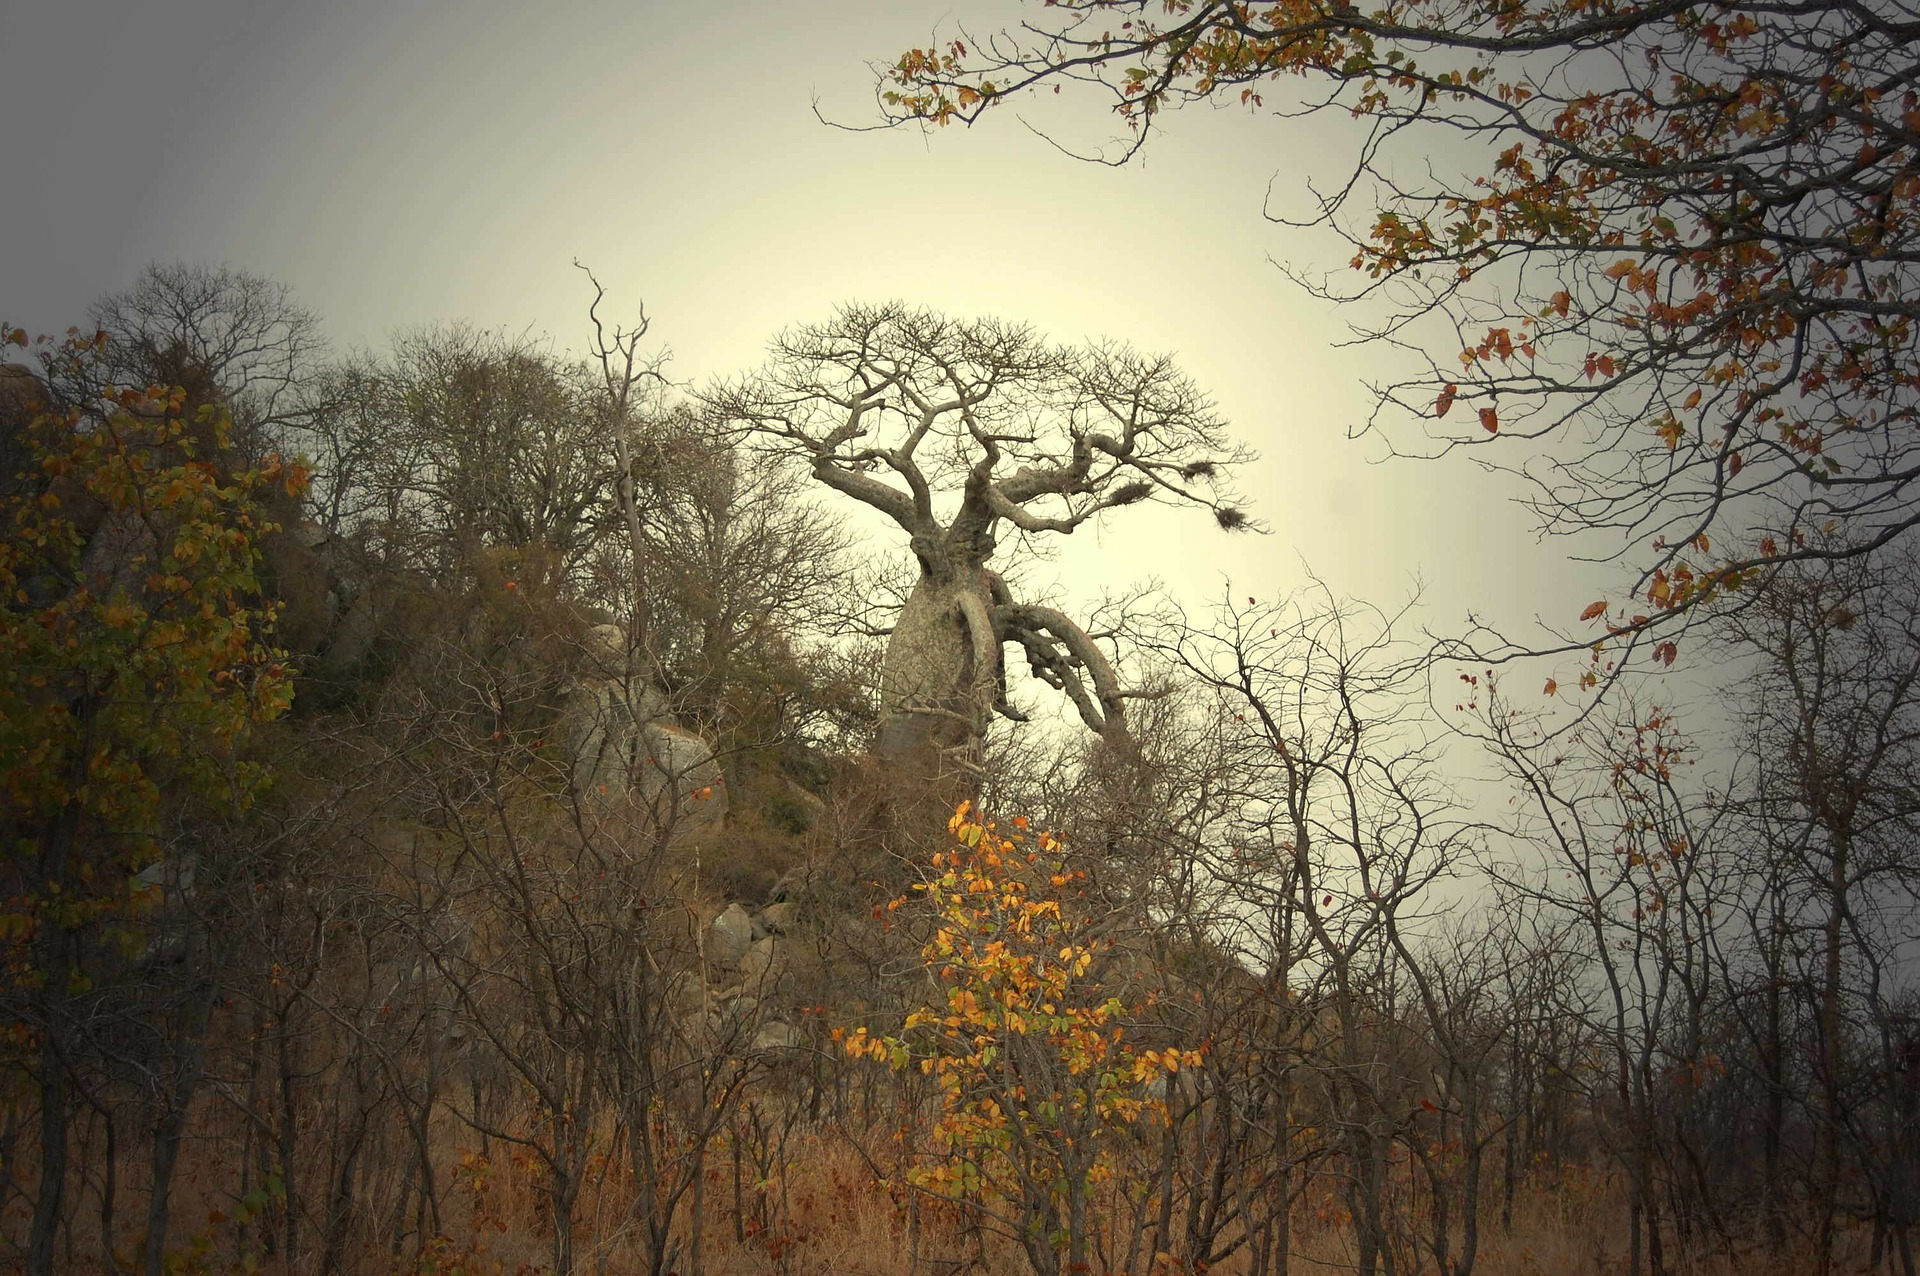 baobab-tree-277427_1920